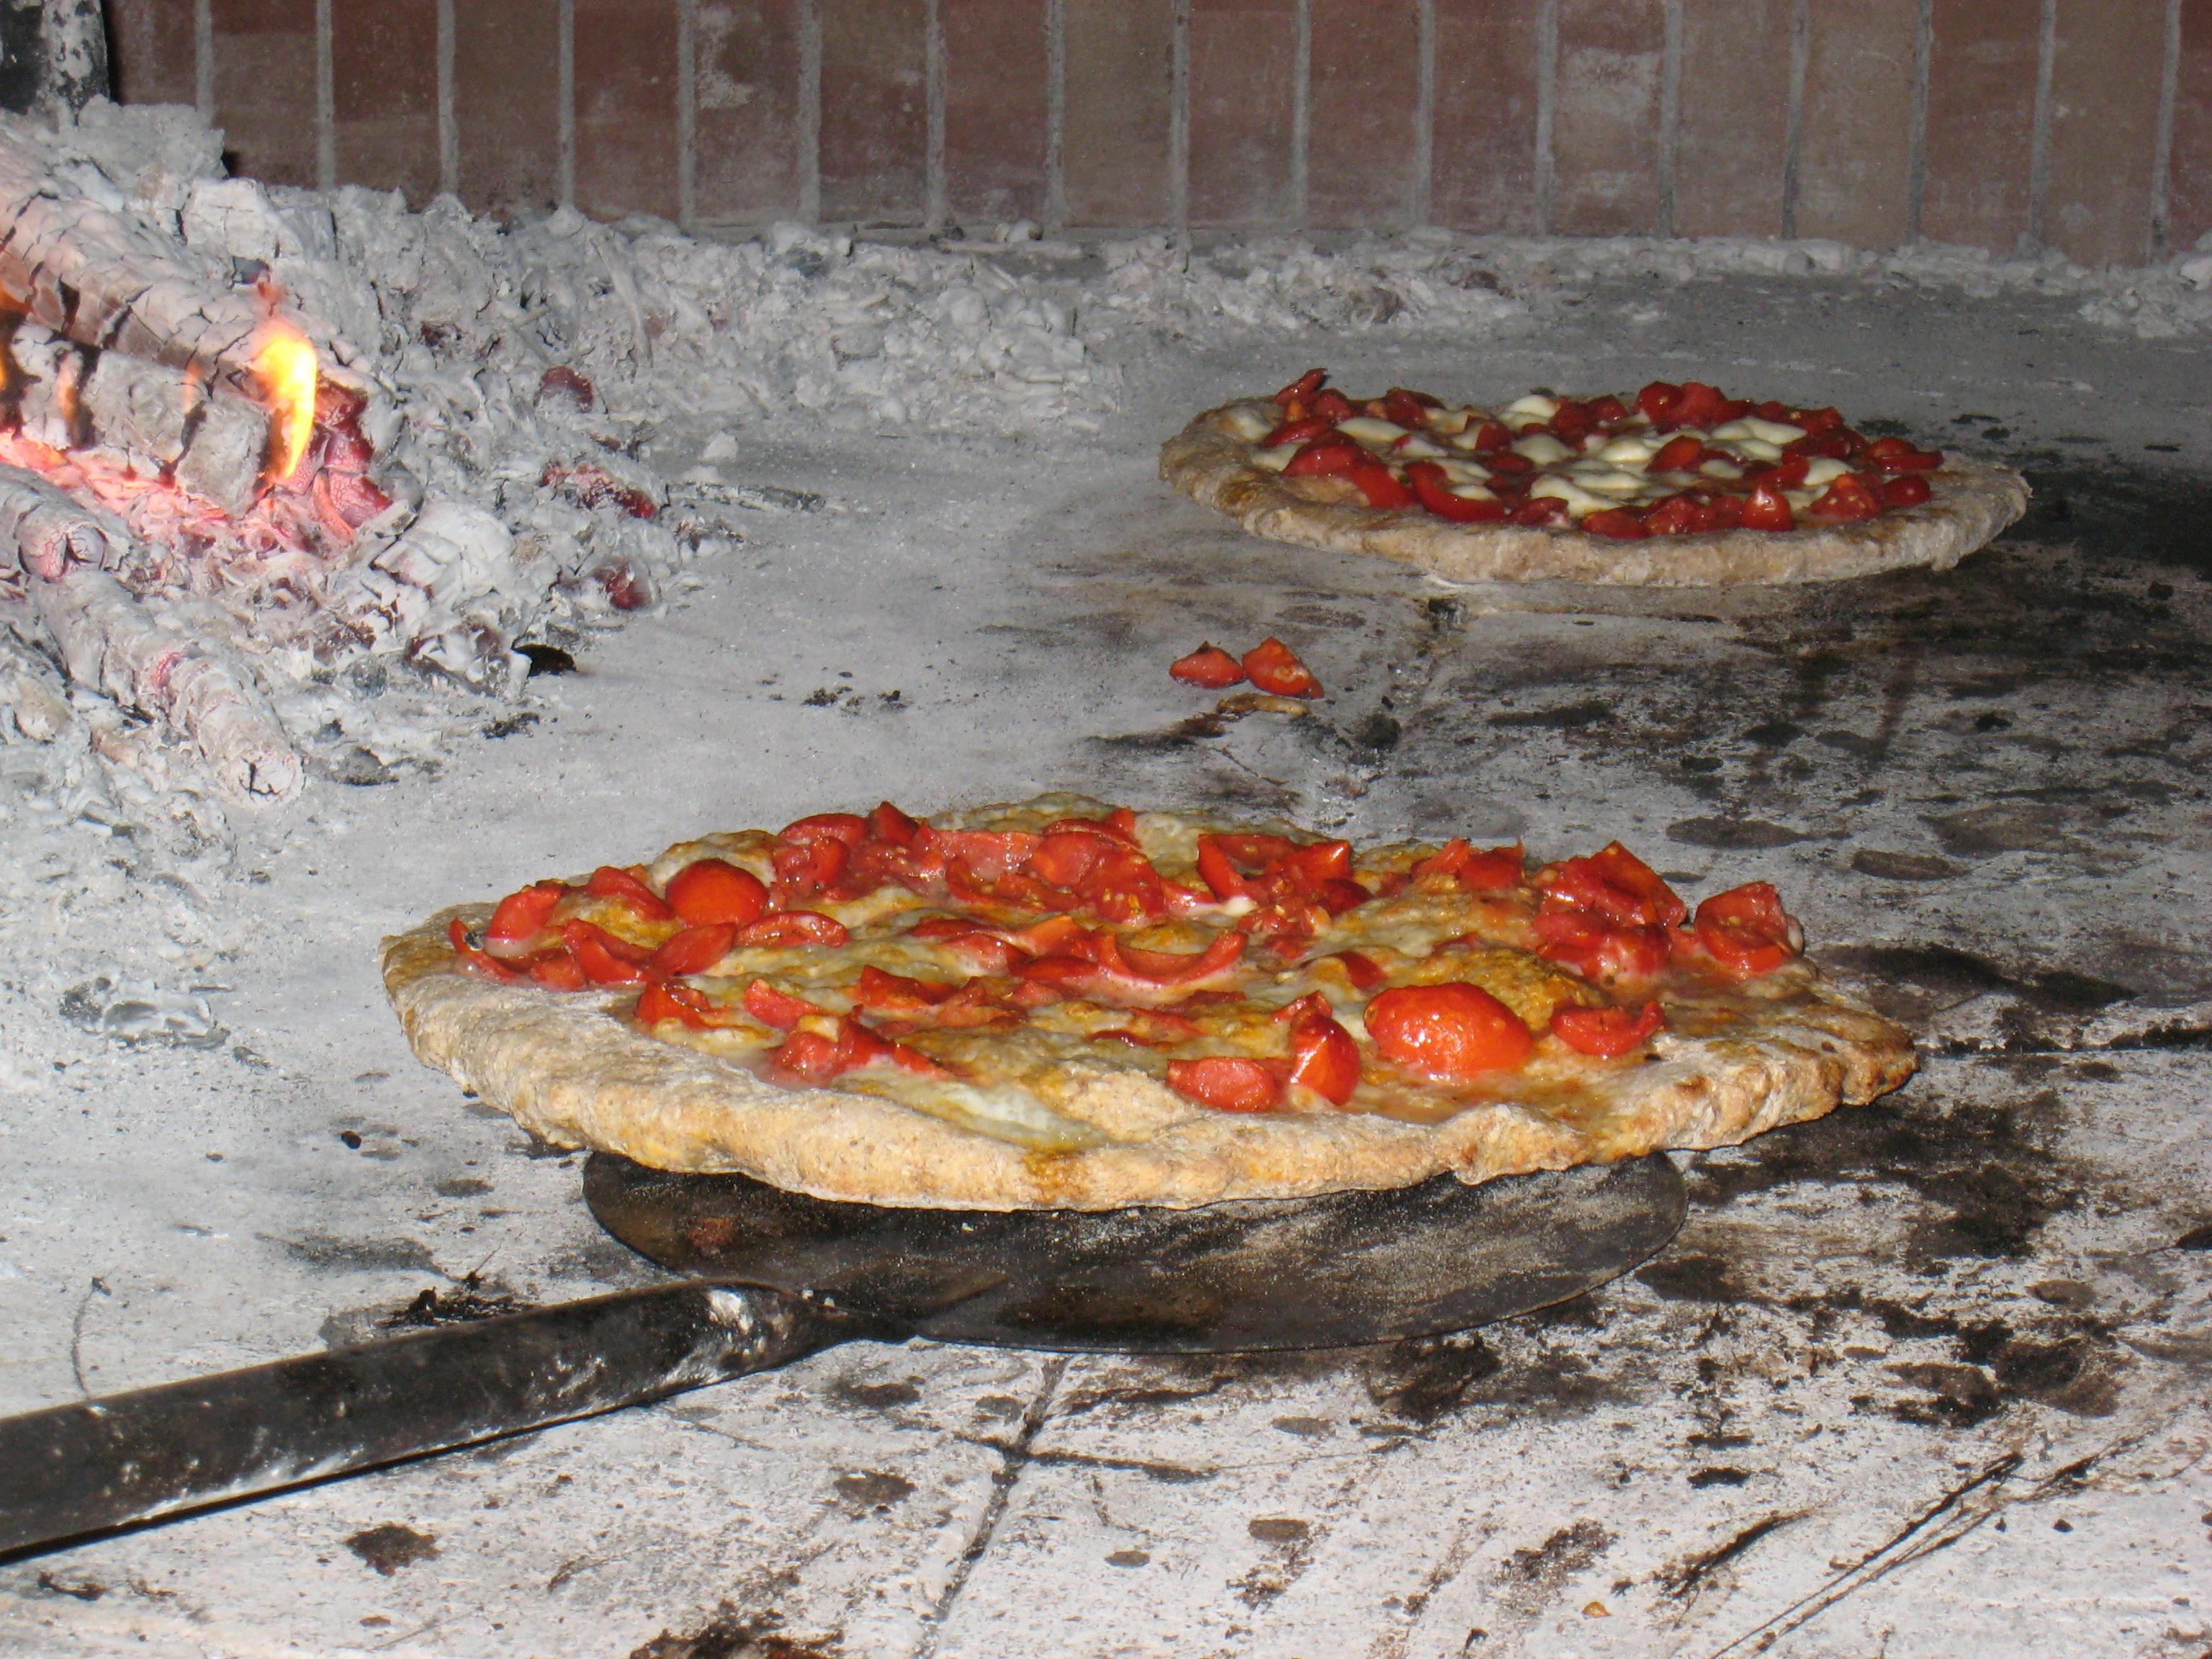 Fotos gratis : madera, restaurante, piedra, plato, comida, cocina ...